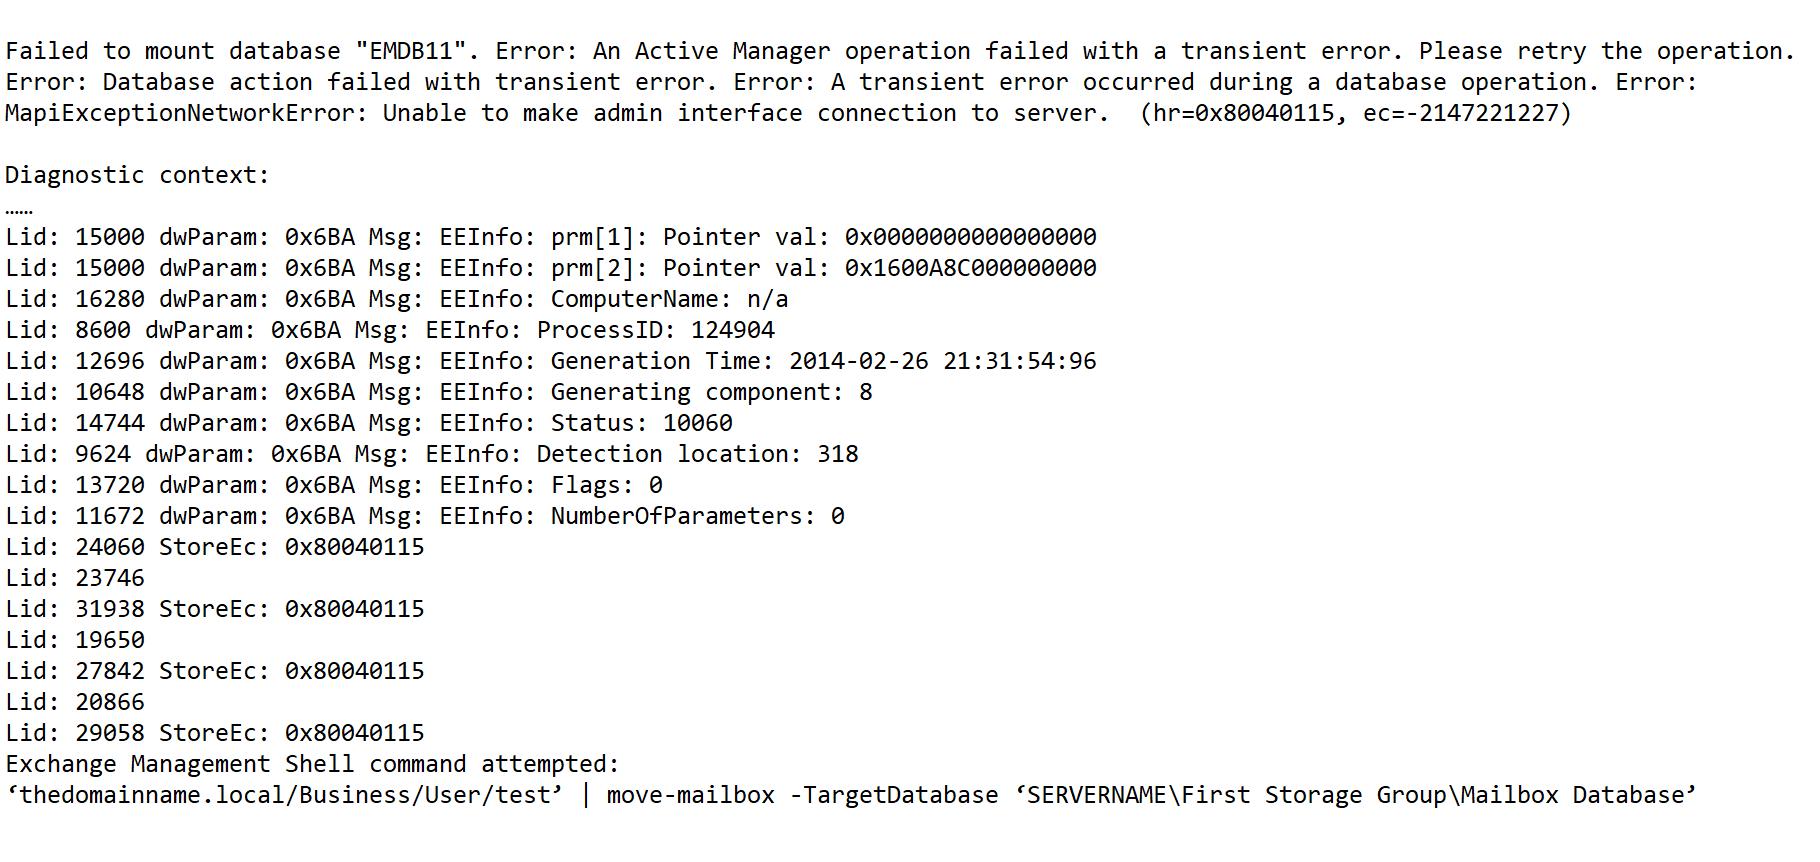 mapiexceptionnetworkerror unable to mount database error